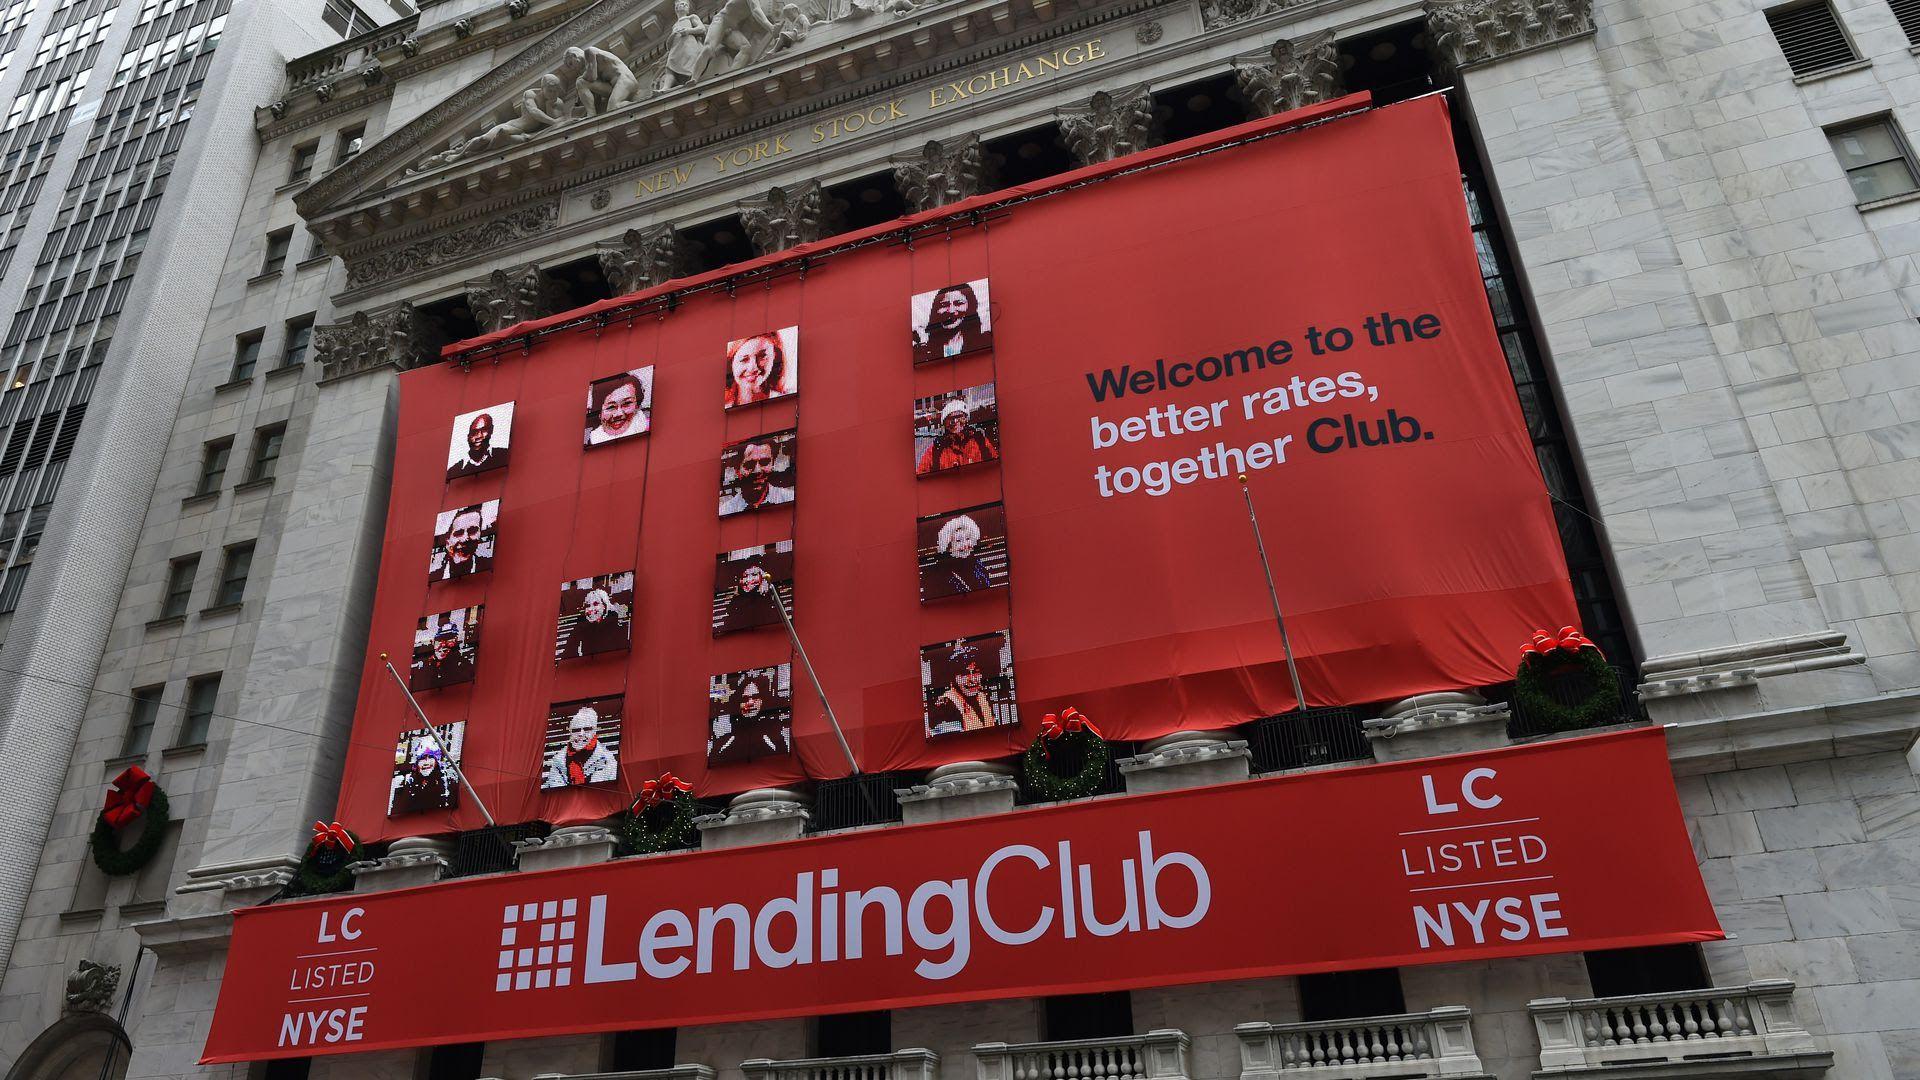 LendingClub to buy Radius Bank in $185 million deal - Axios